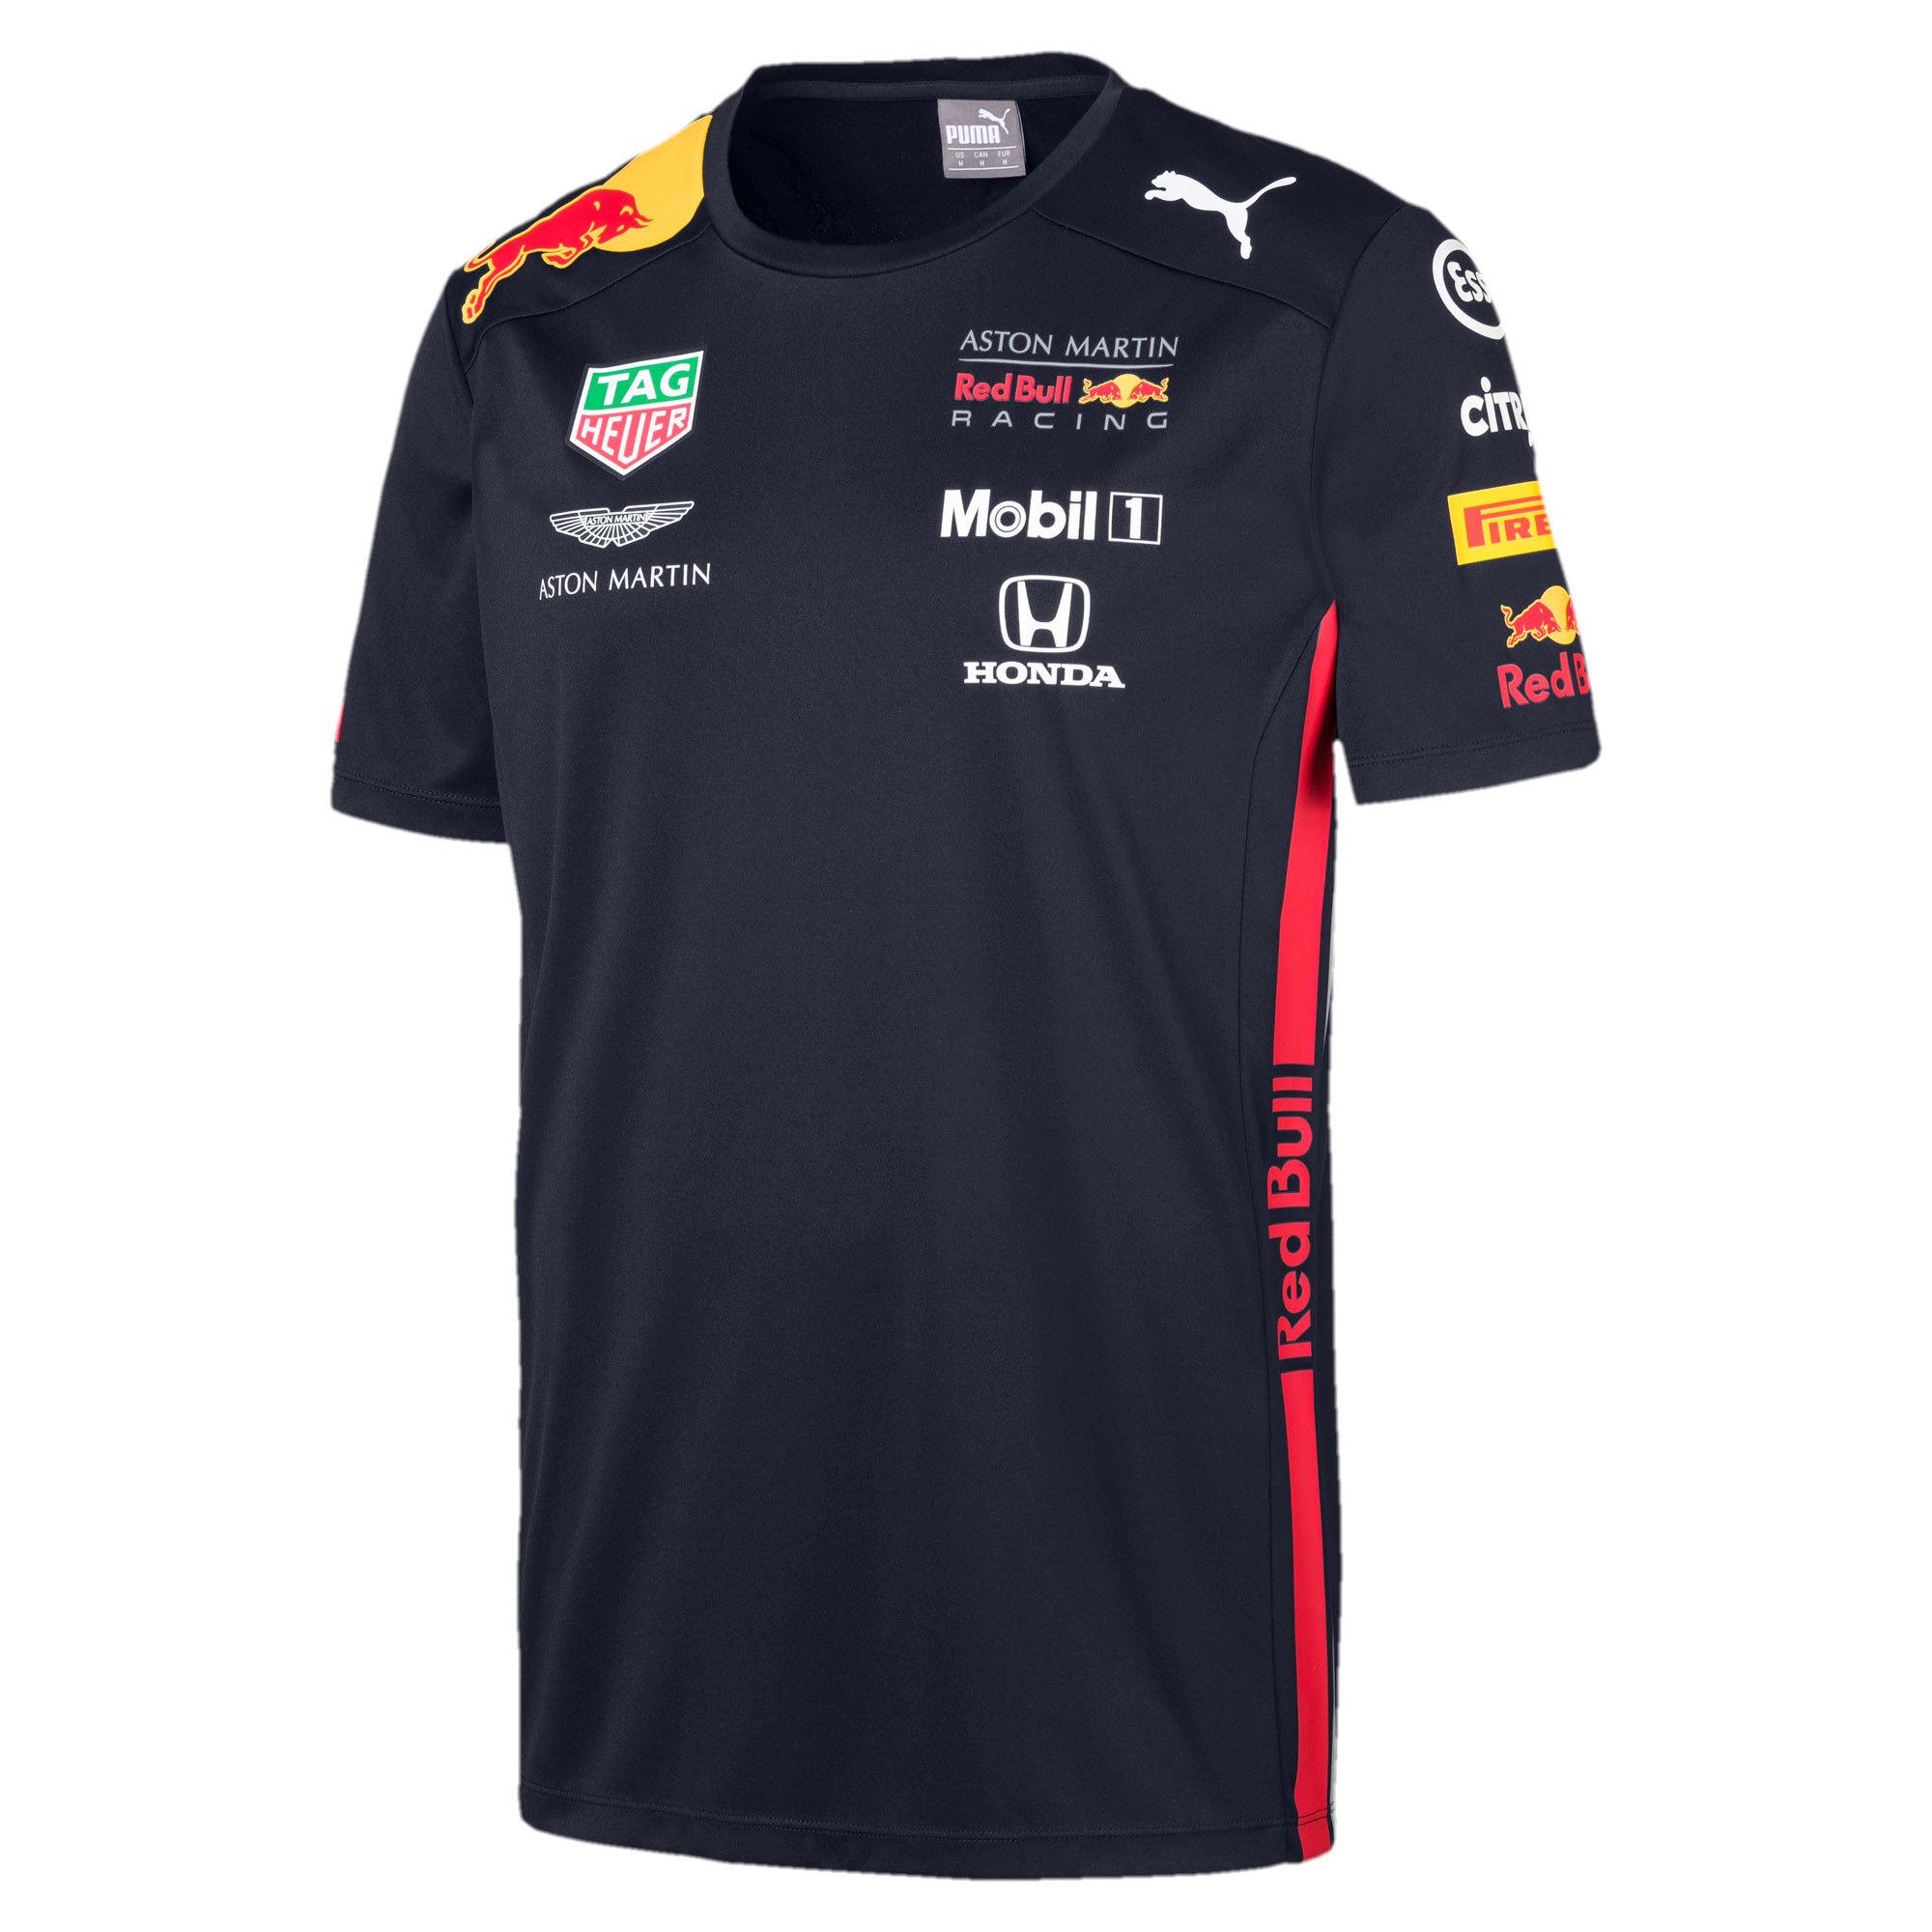 Thumbnail 1 of Red Bull Racing Herren Team T-Shirt, NIGHT SKY, medium